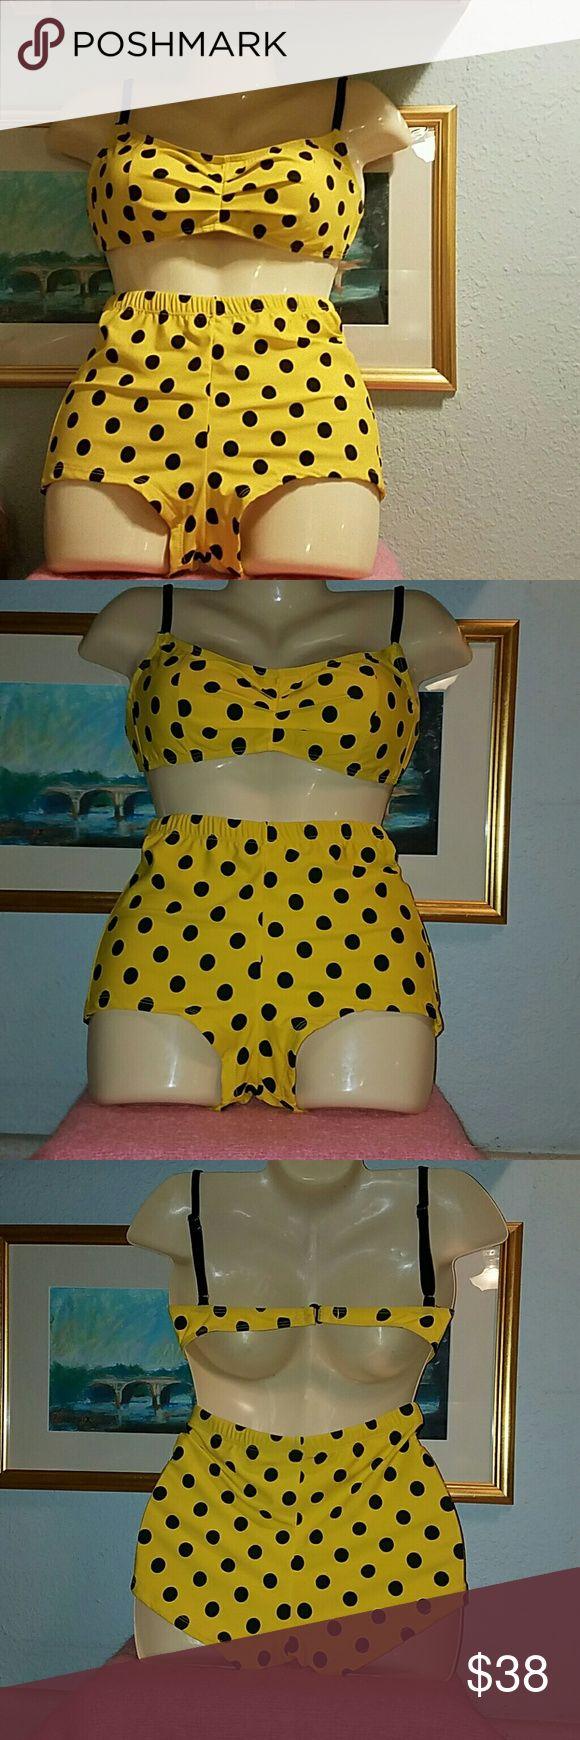 Girl Howdy pin up yellow polka dot bikini Girl howdy pin up yellow polka dot bikini.  High waist. Girl howdy  Swim Bikinis